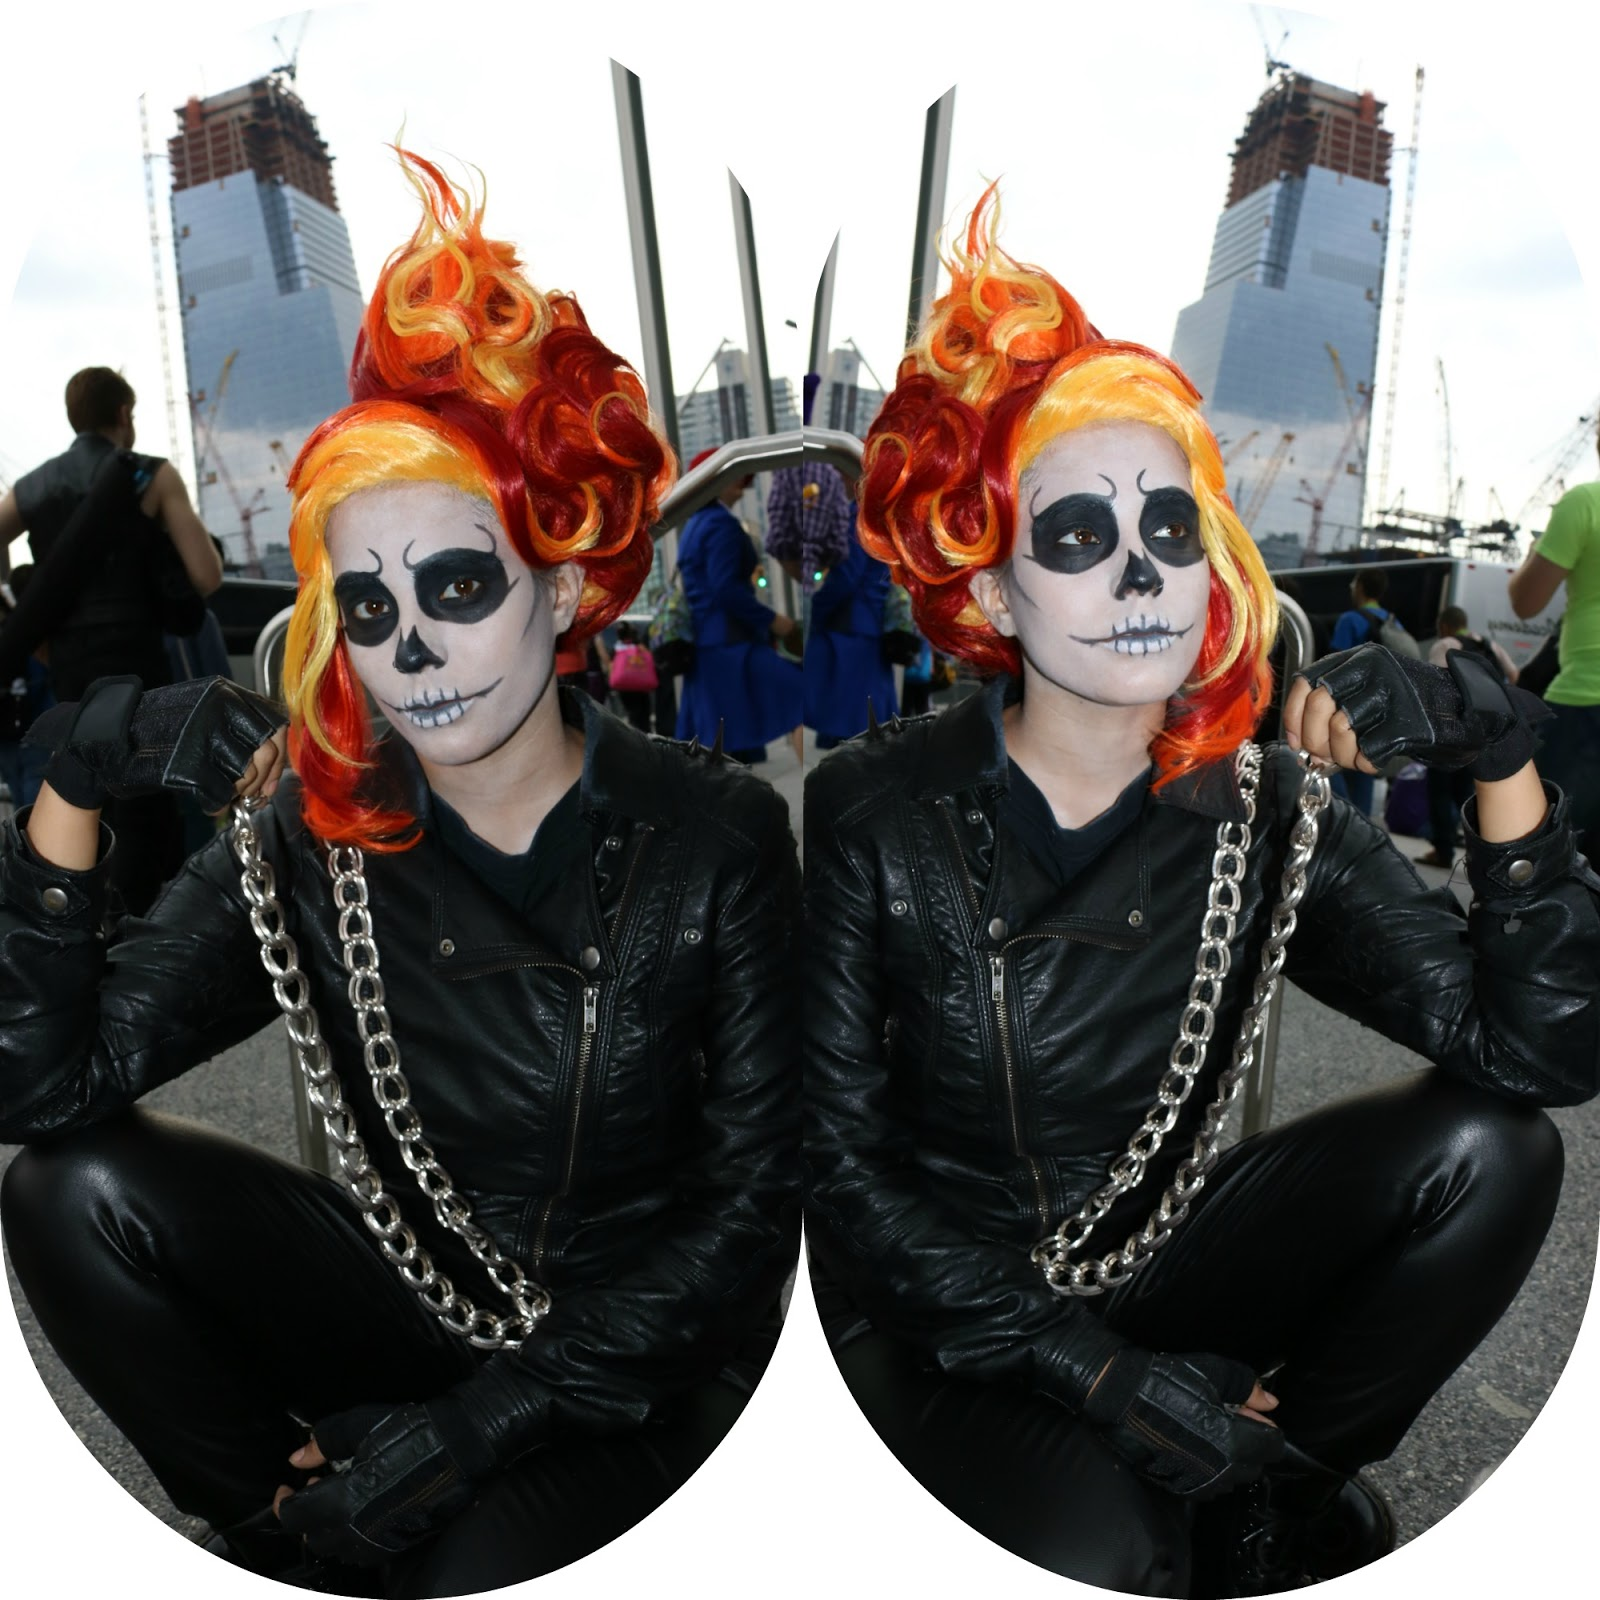 Ghost rider cosplay at new york comic con 2015 nubias nonsense solutioingenieria Gallery